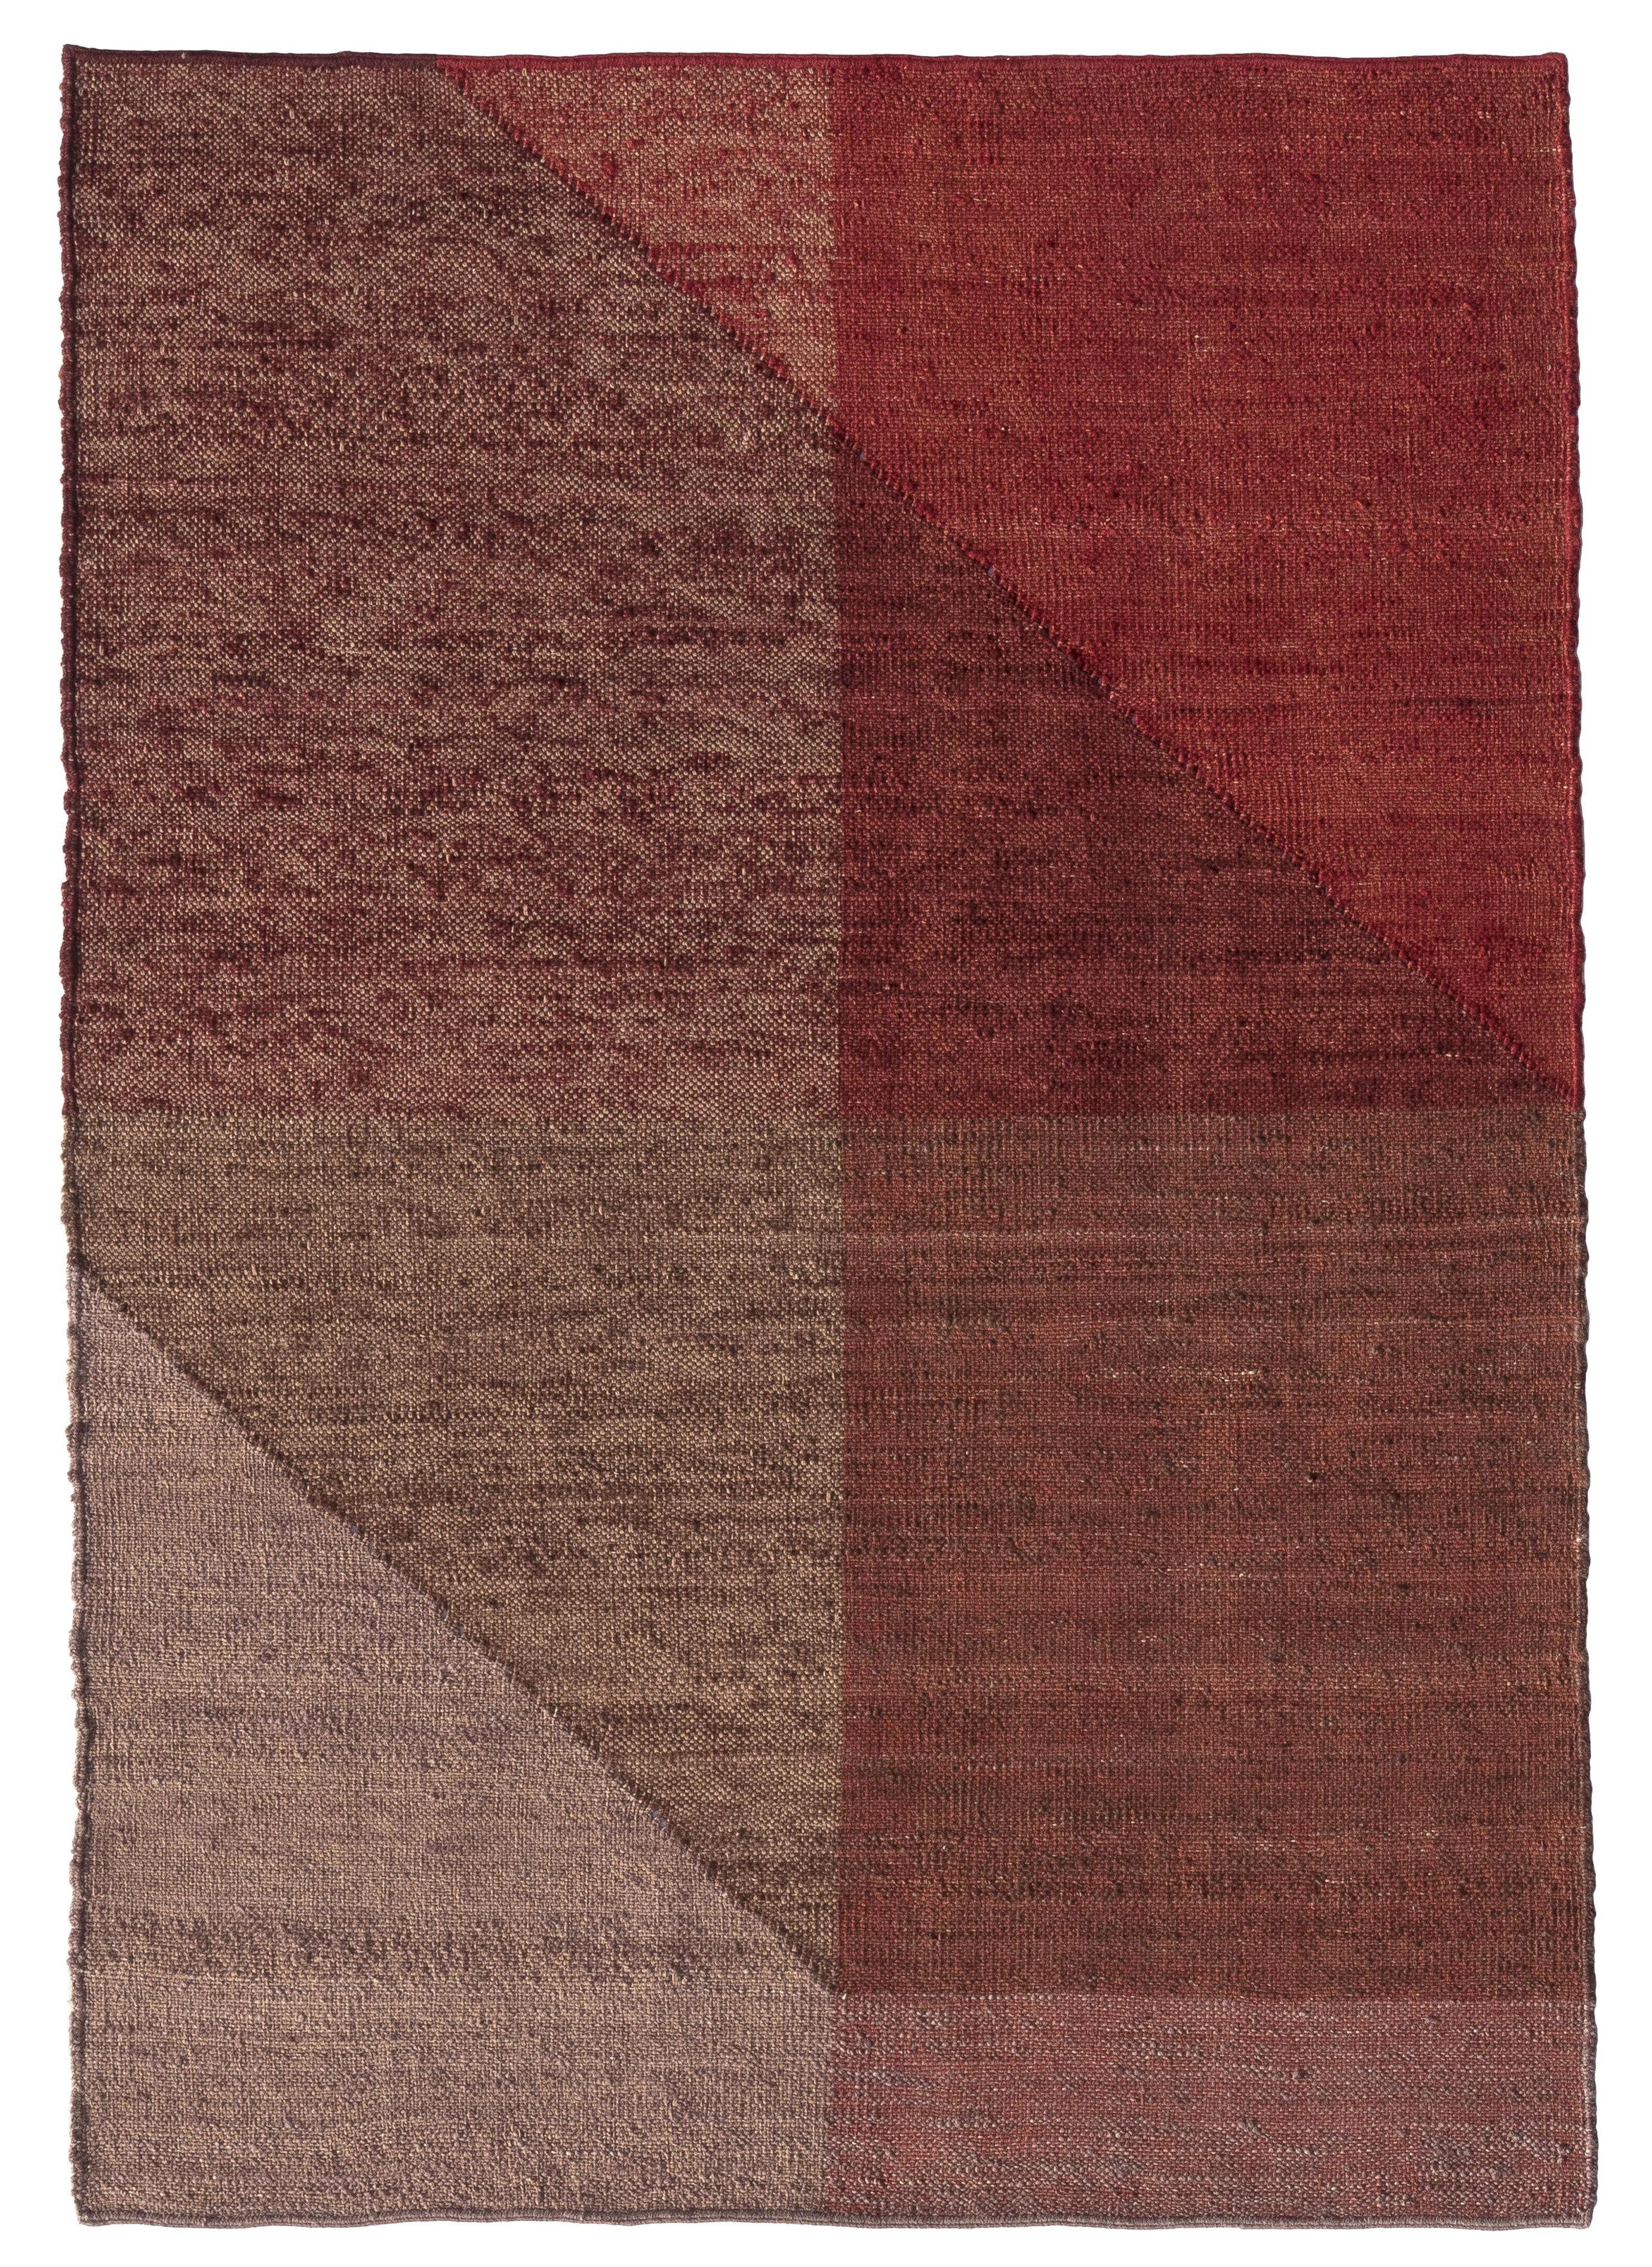 Interni - Tappeti - Tappeto Capas 1 - / 200 x 300 cm di Nanimarquina - Rossi - Lana